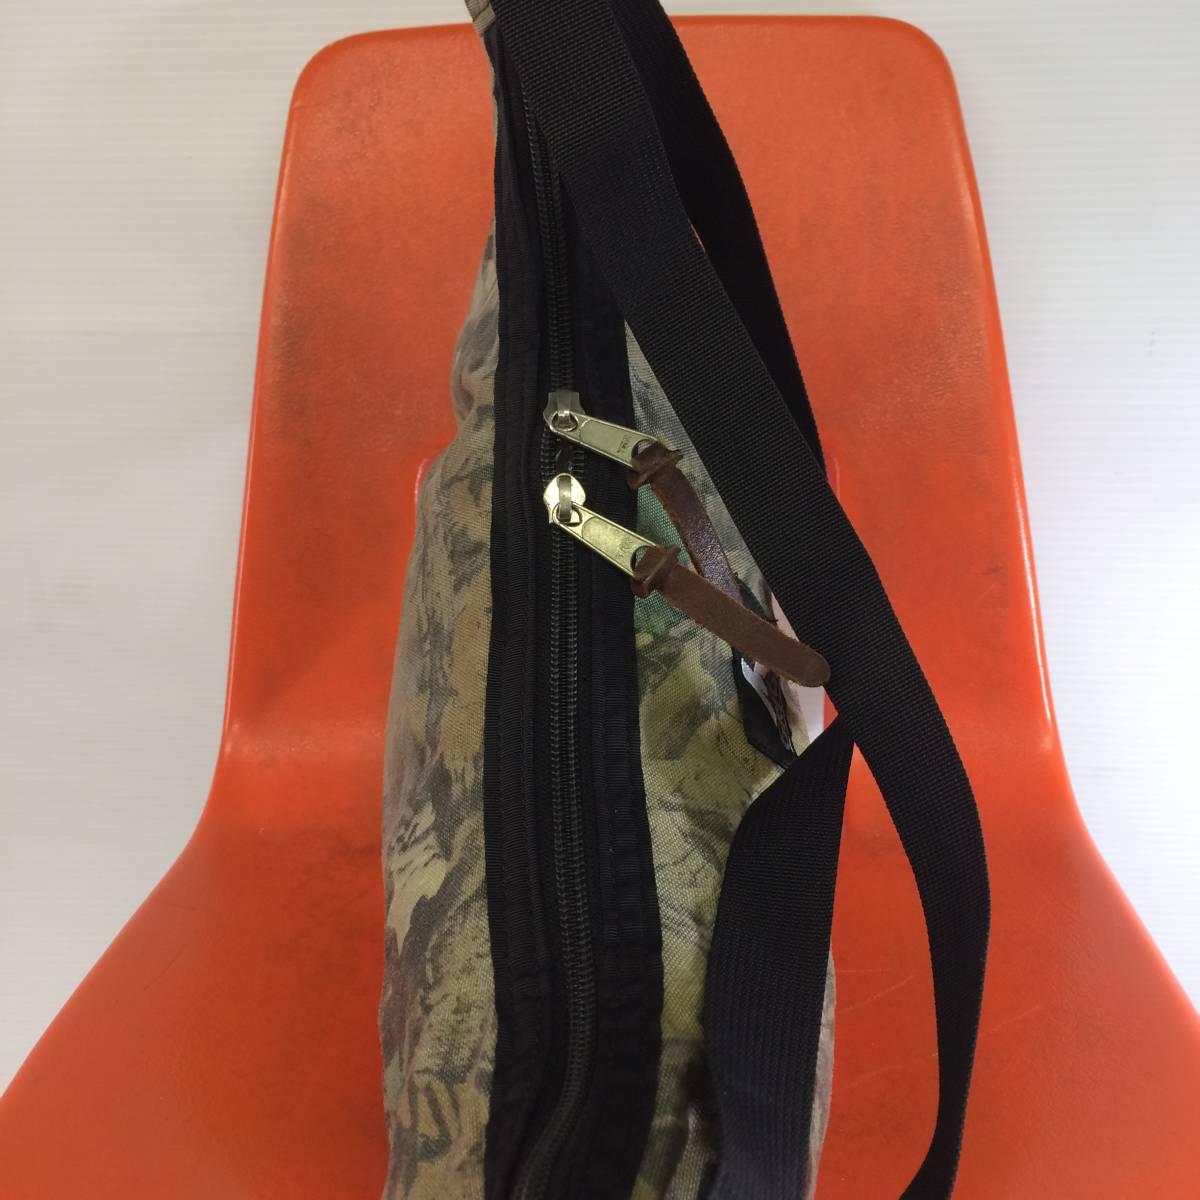 USA製 グレゴリー ラフィンバッグ アドバンテージティンバー 迷彩 gregory アメリカ製 旧タグ 三日月型バッグ ショルダーバッグ